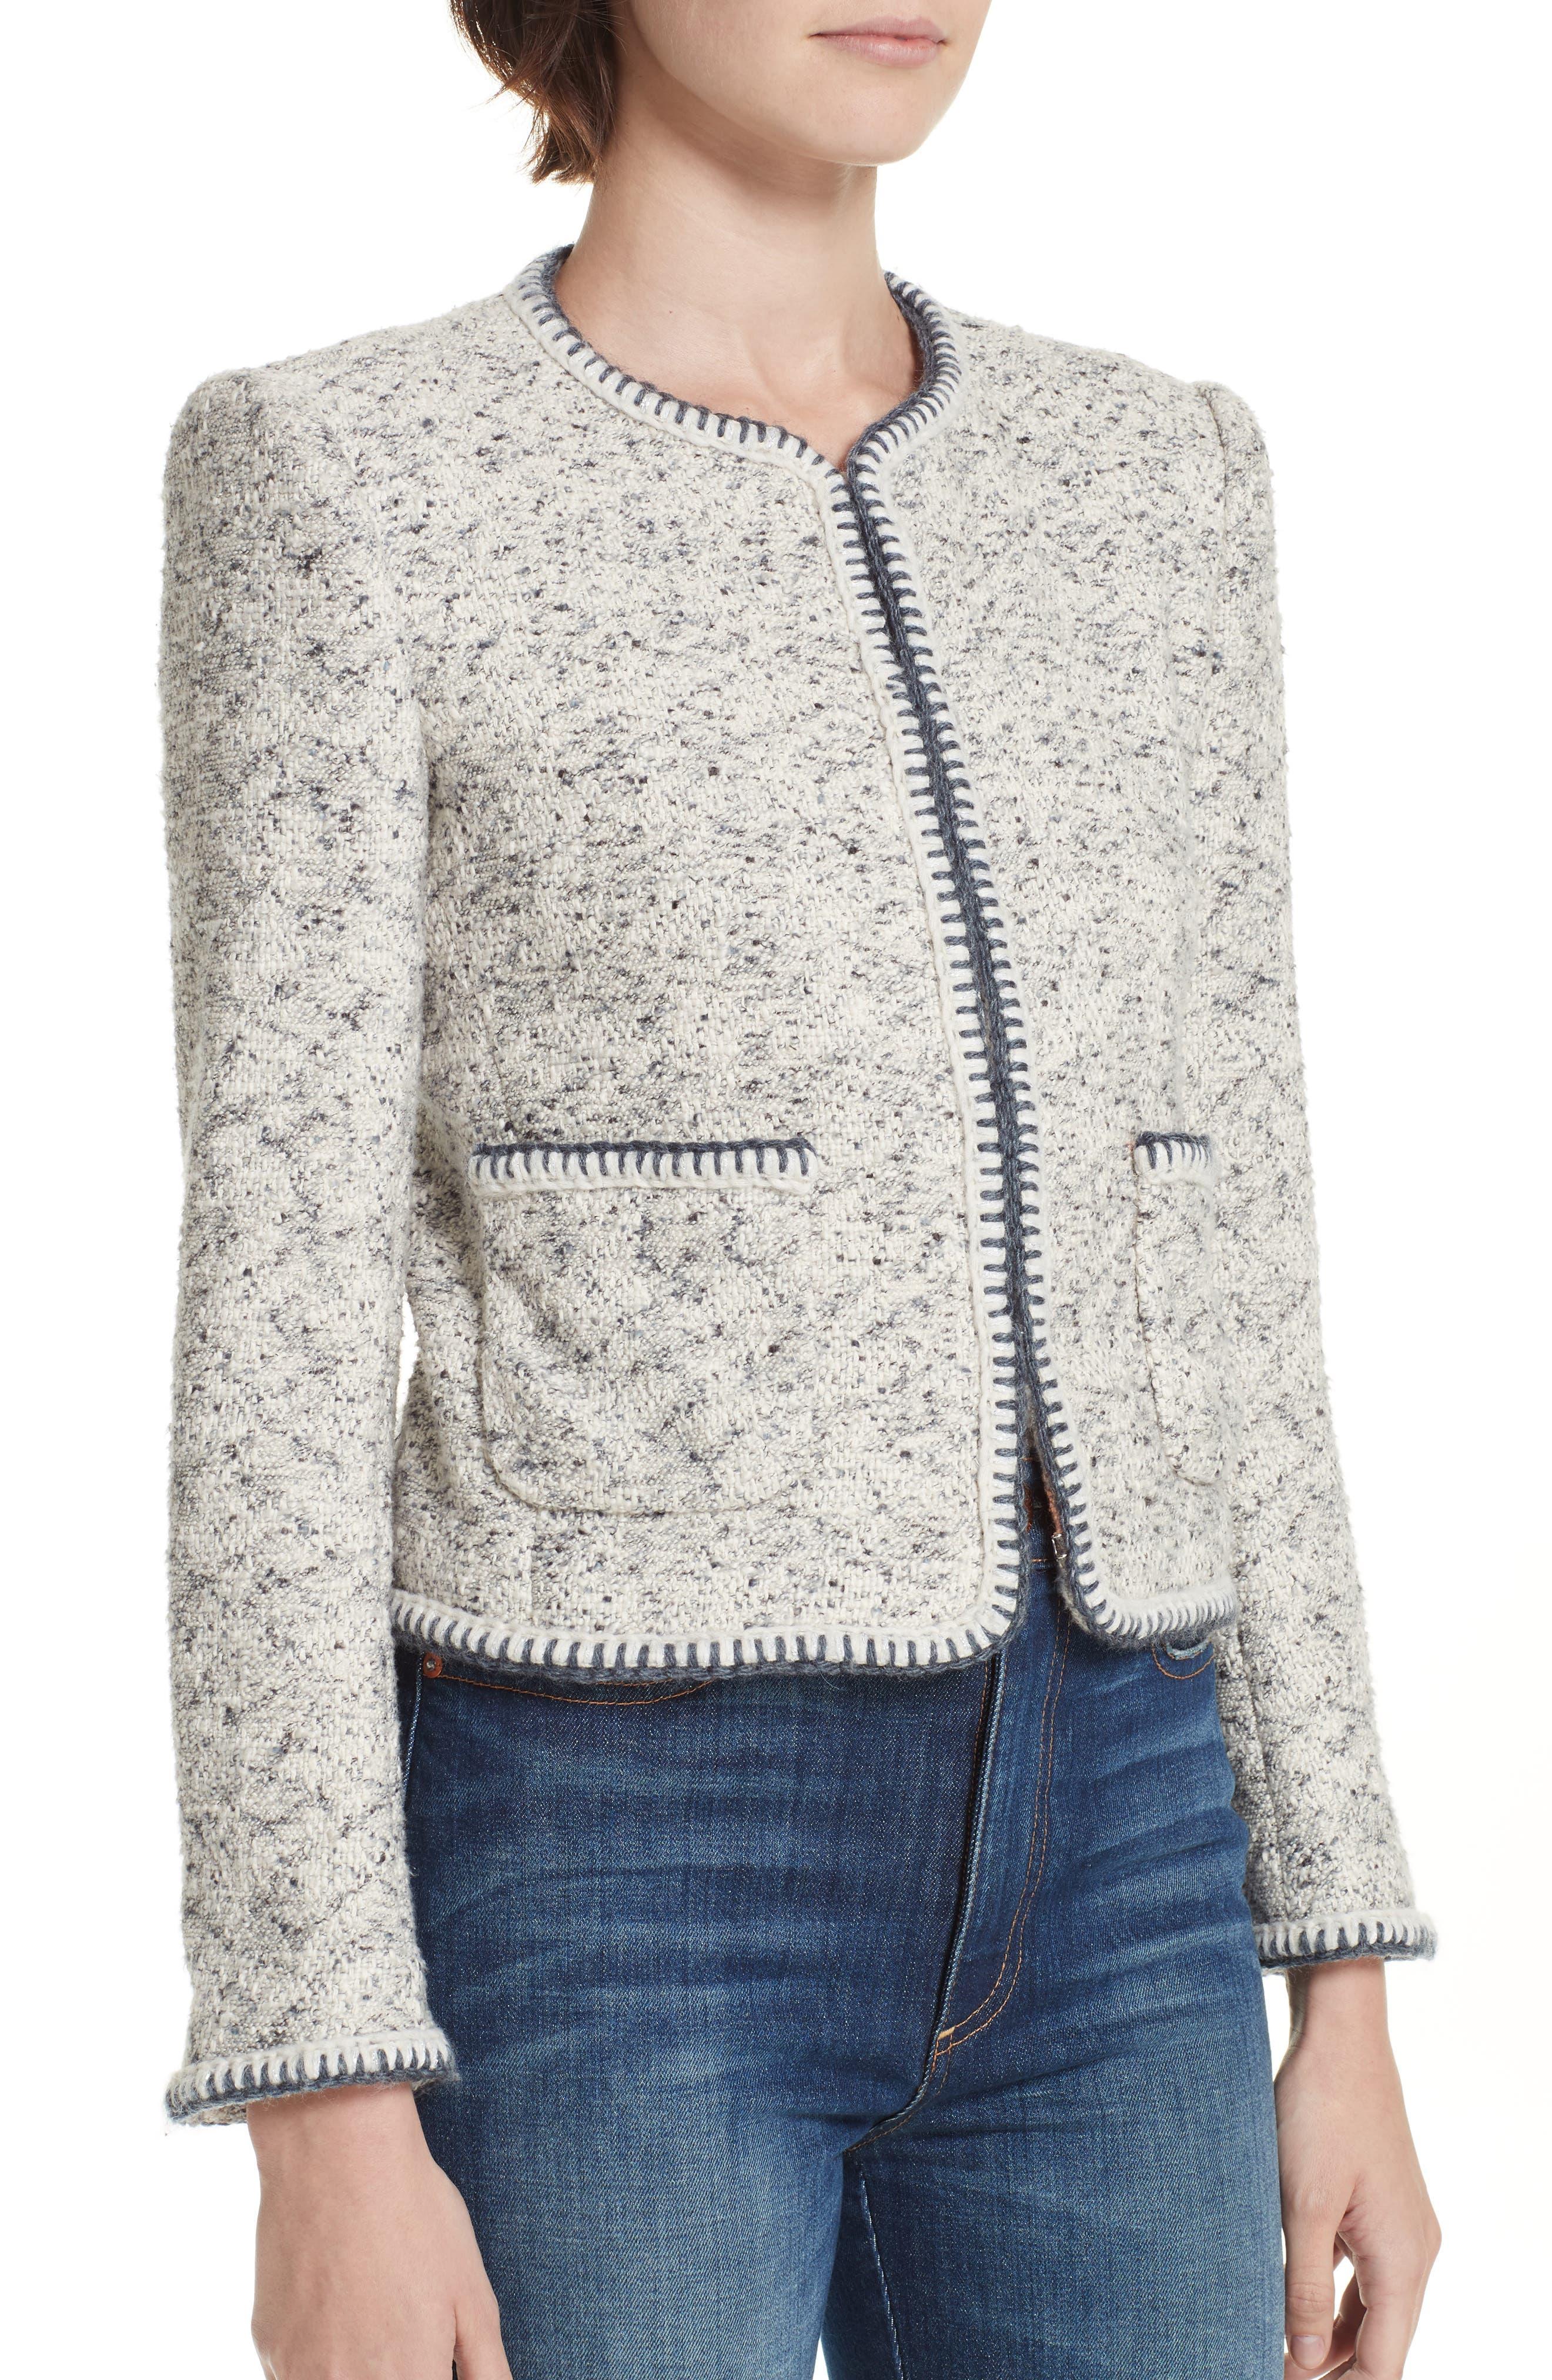 Speckled Tweed Jacket,                             Alternate thumbnail 4, color,                             054